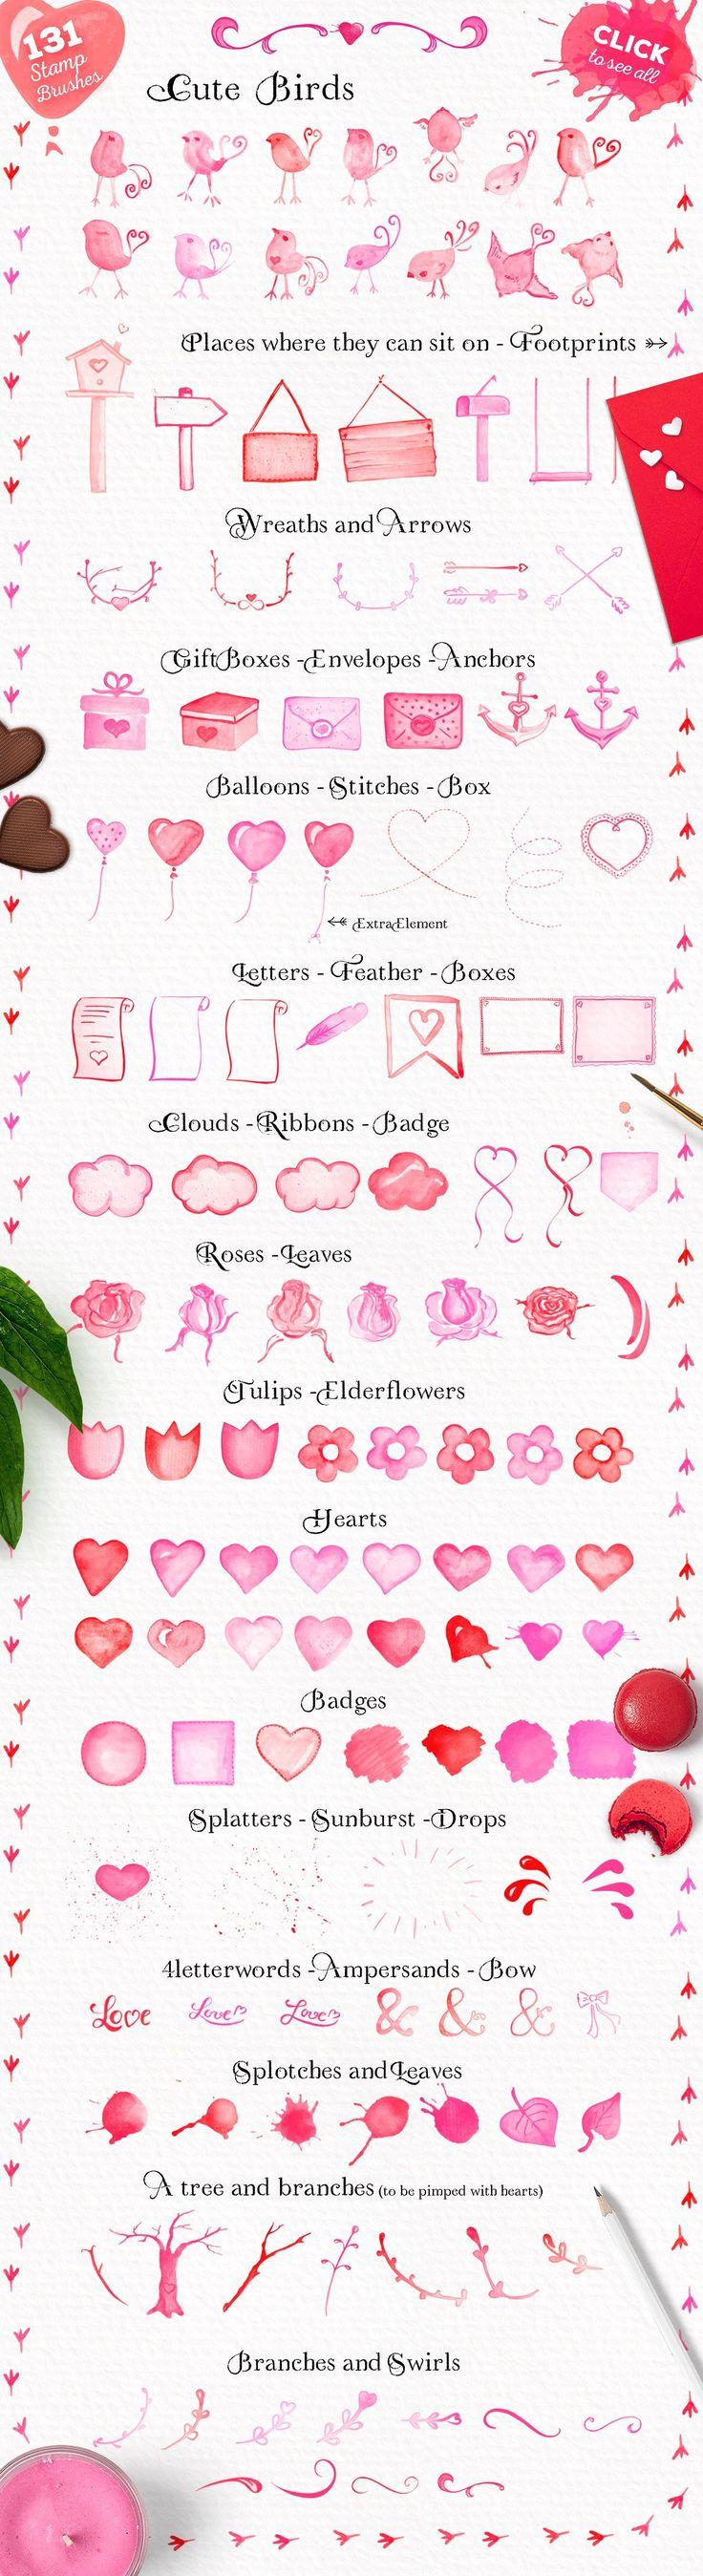 Cute Valentine Watercolor Brush Set by Doris Nawratil on @creativemarket